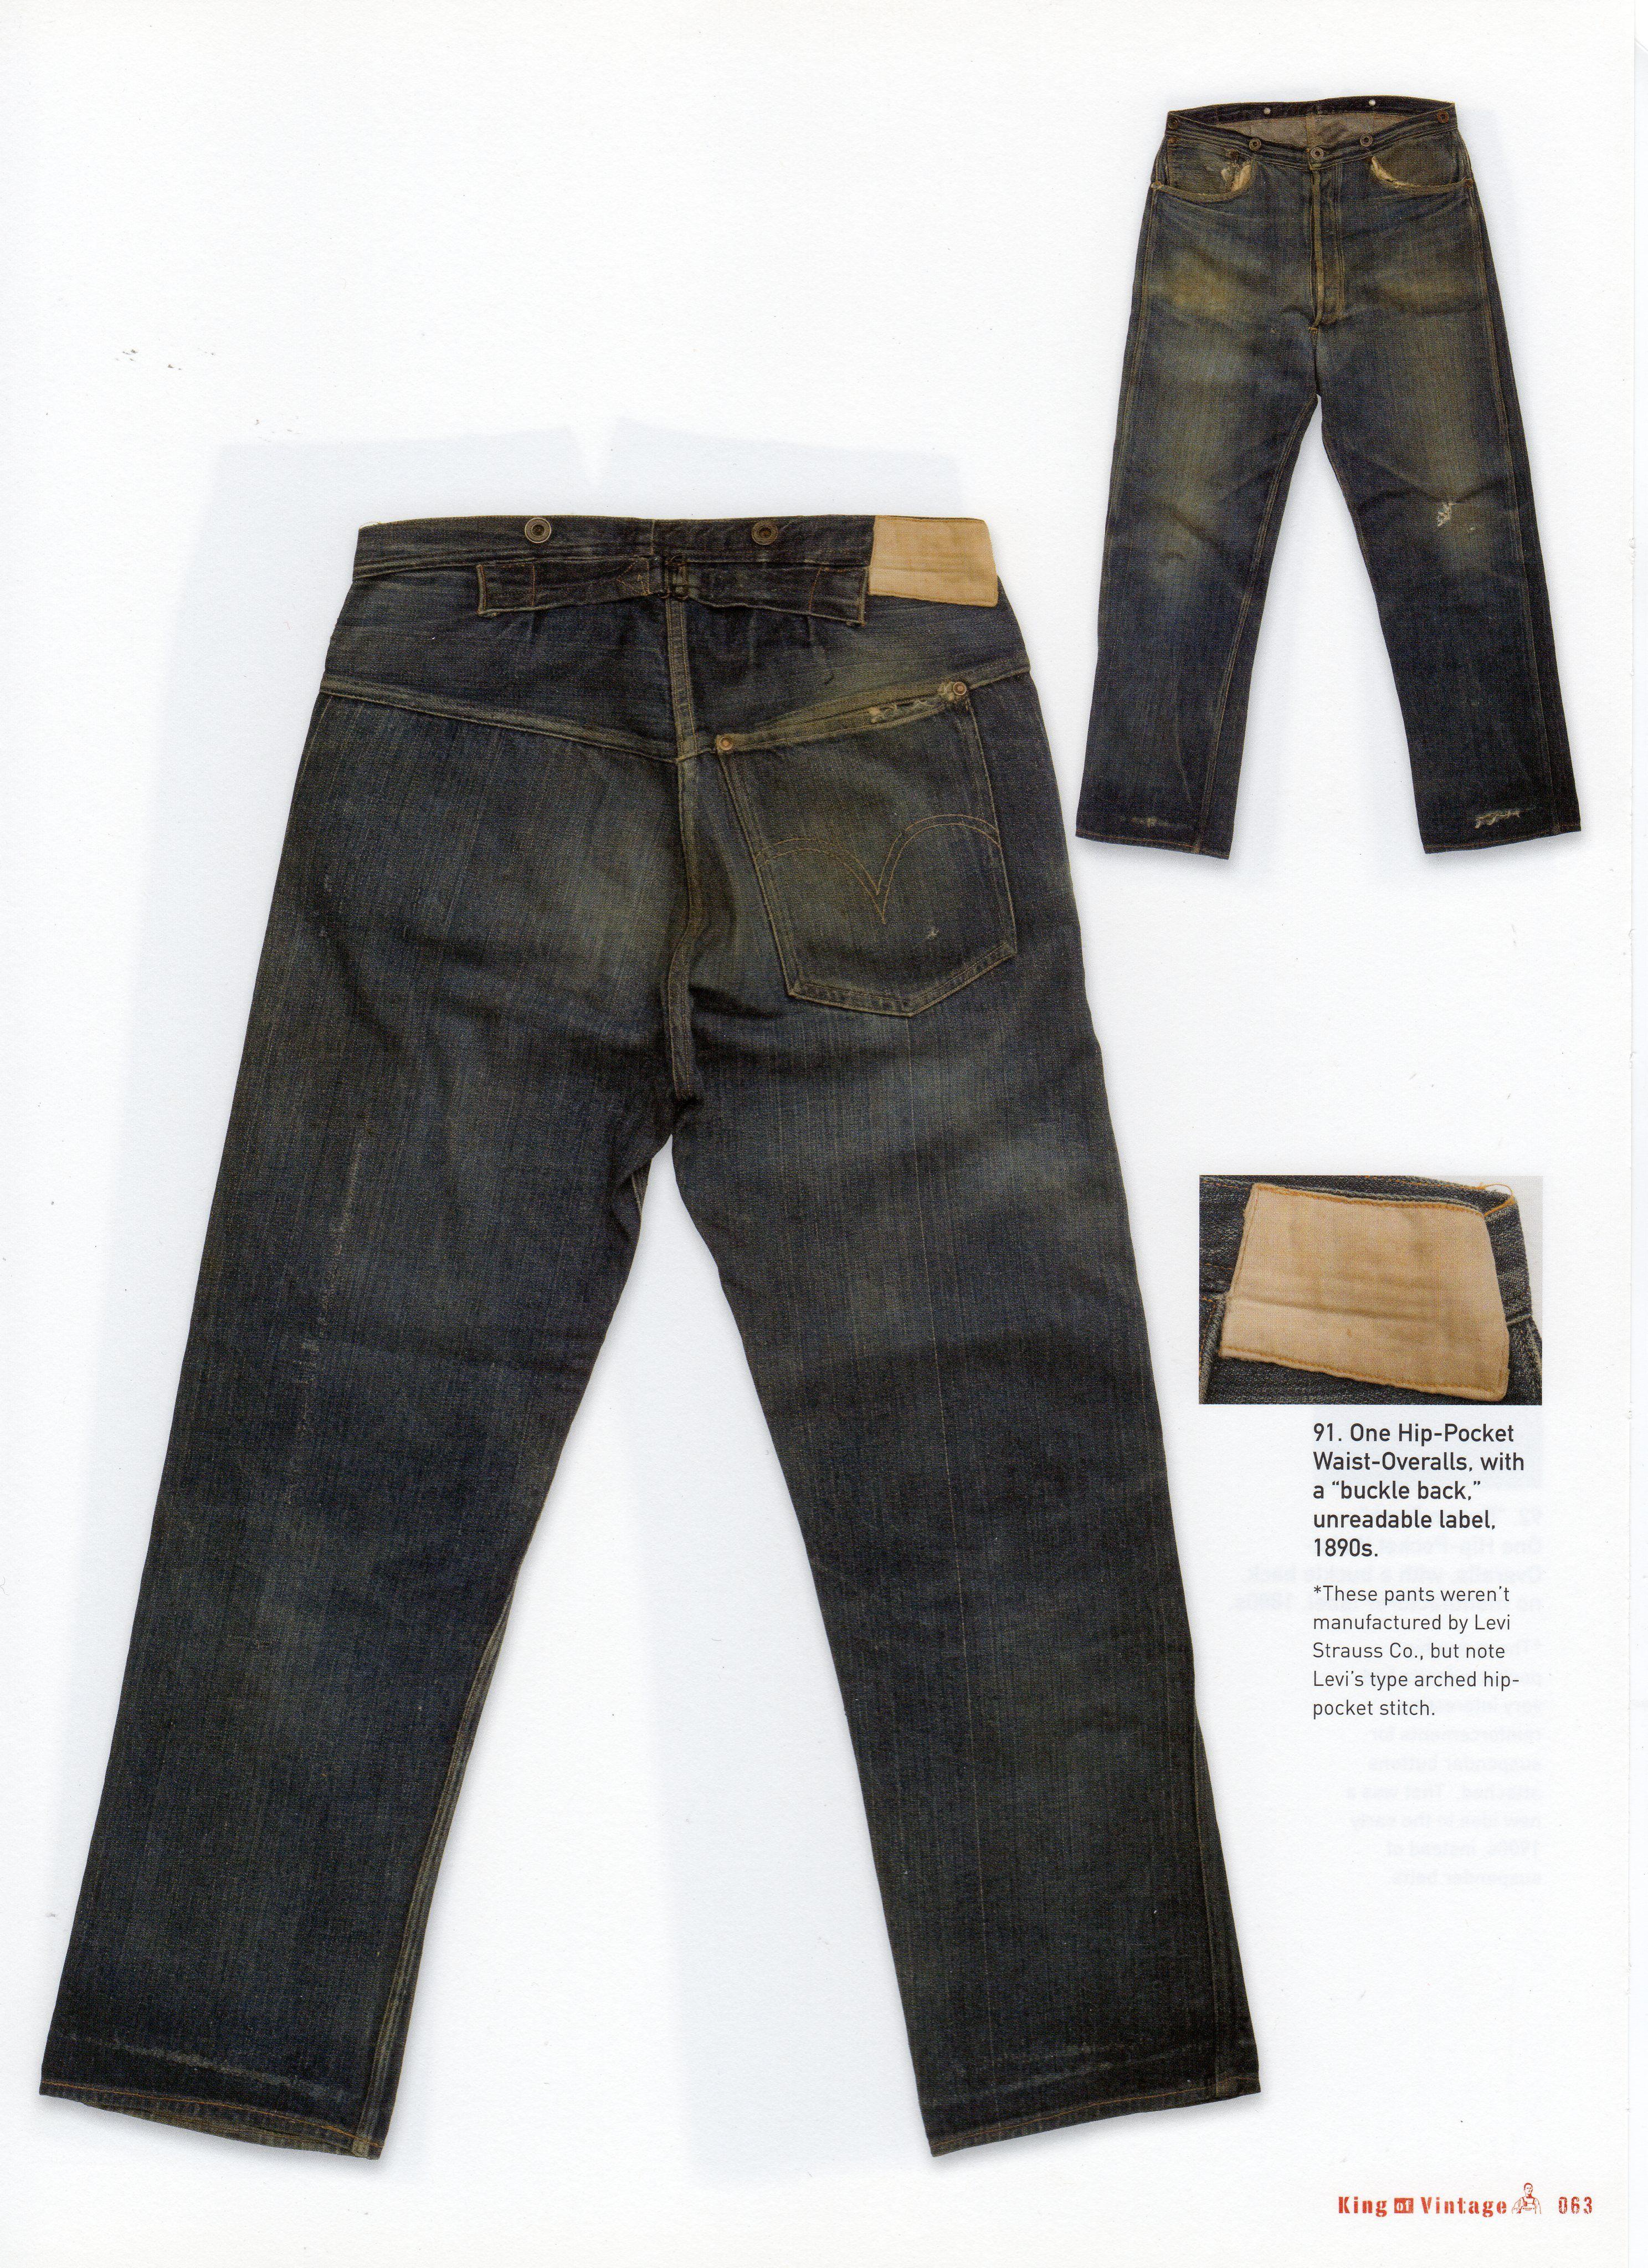 26100634ce9 Levi Strauss Waist-Overalls, 1890's | I love Levi's jeans | Jeans ...